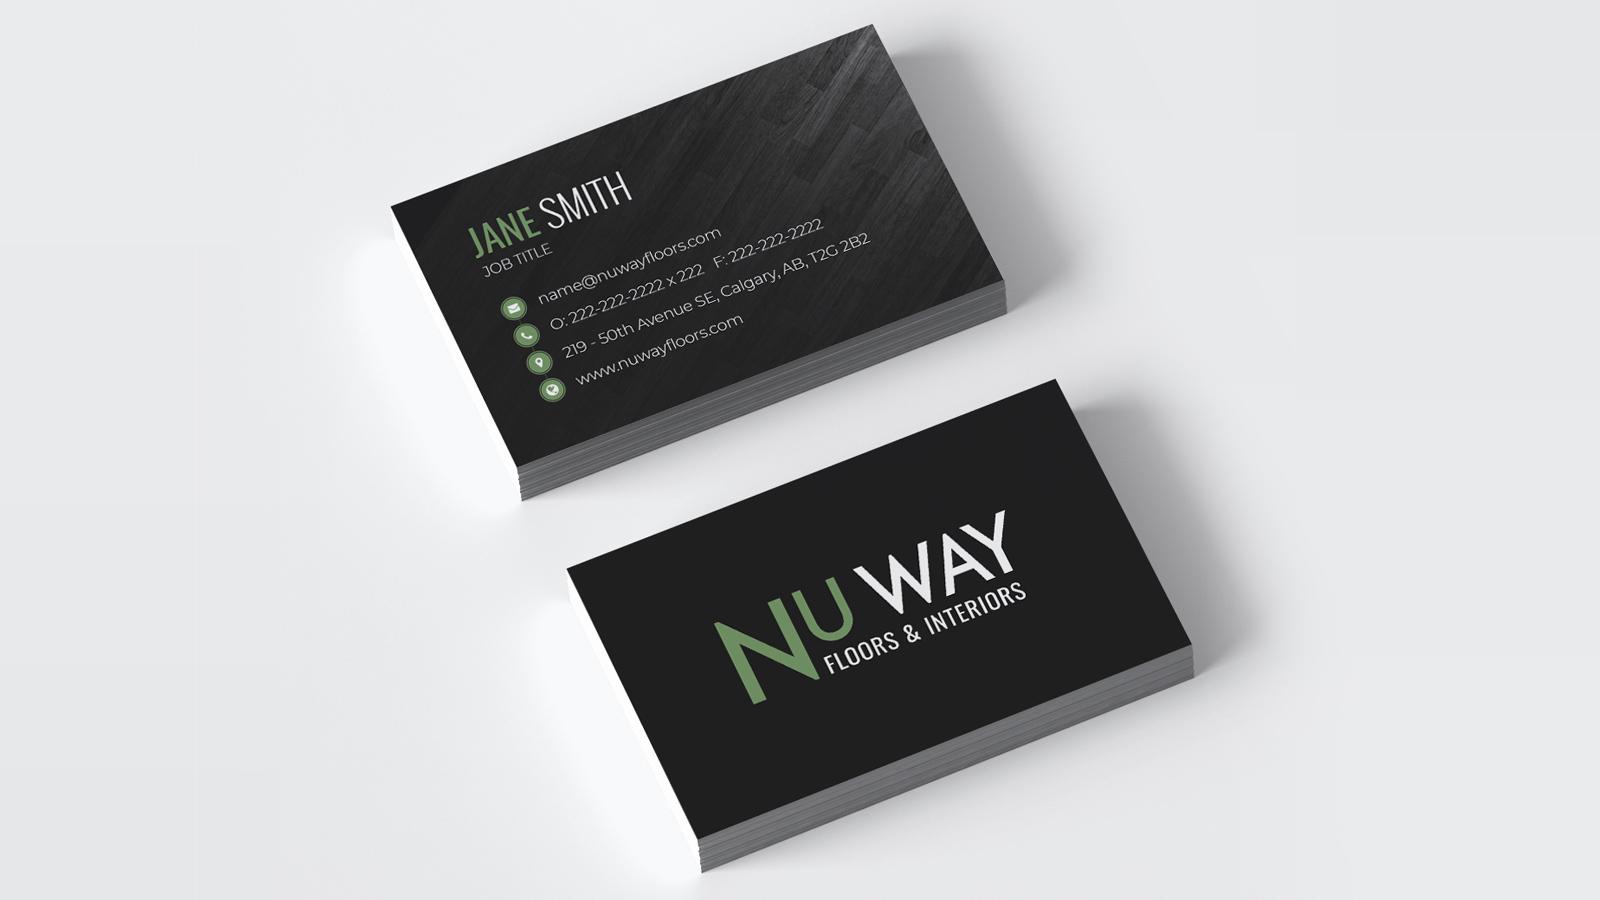 Rebrand: NuWay Floors & Interiors